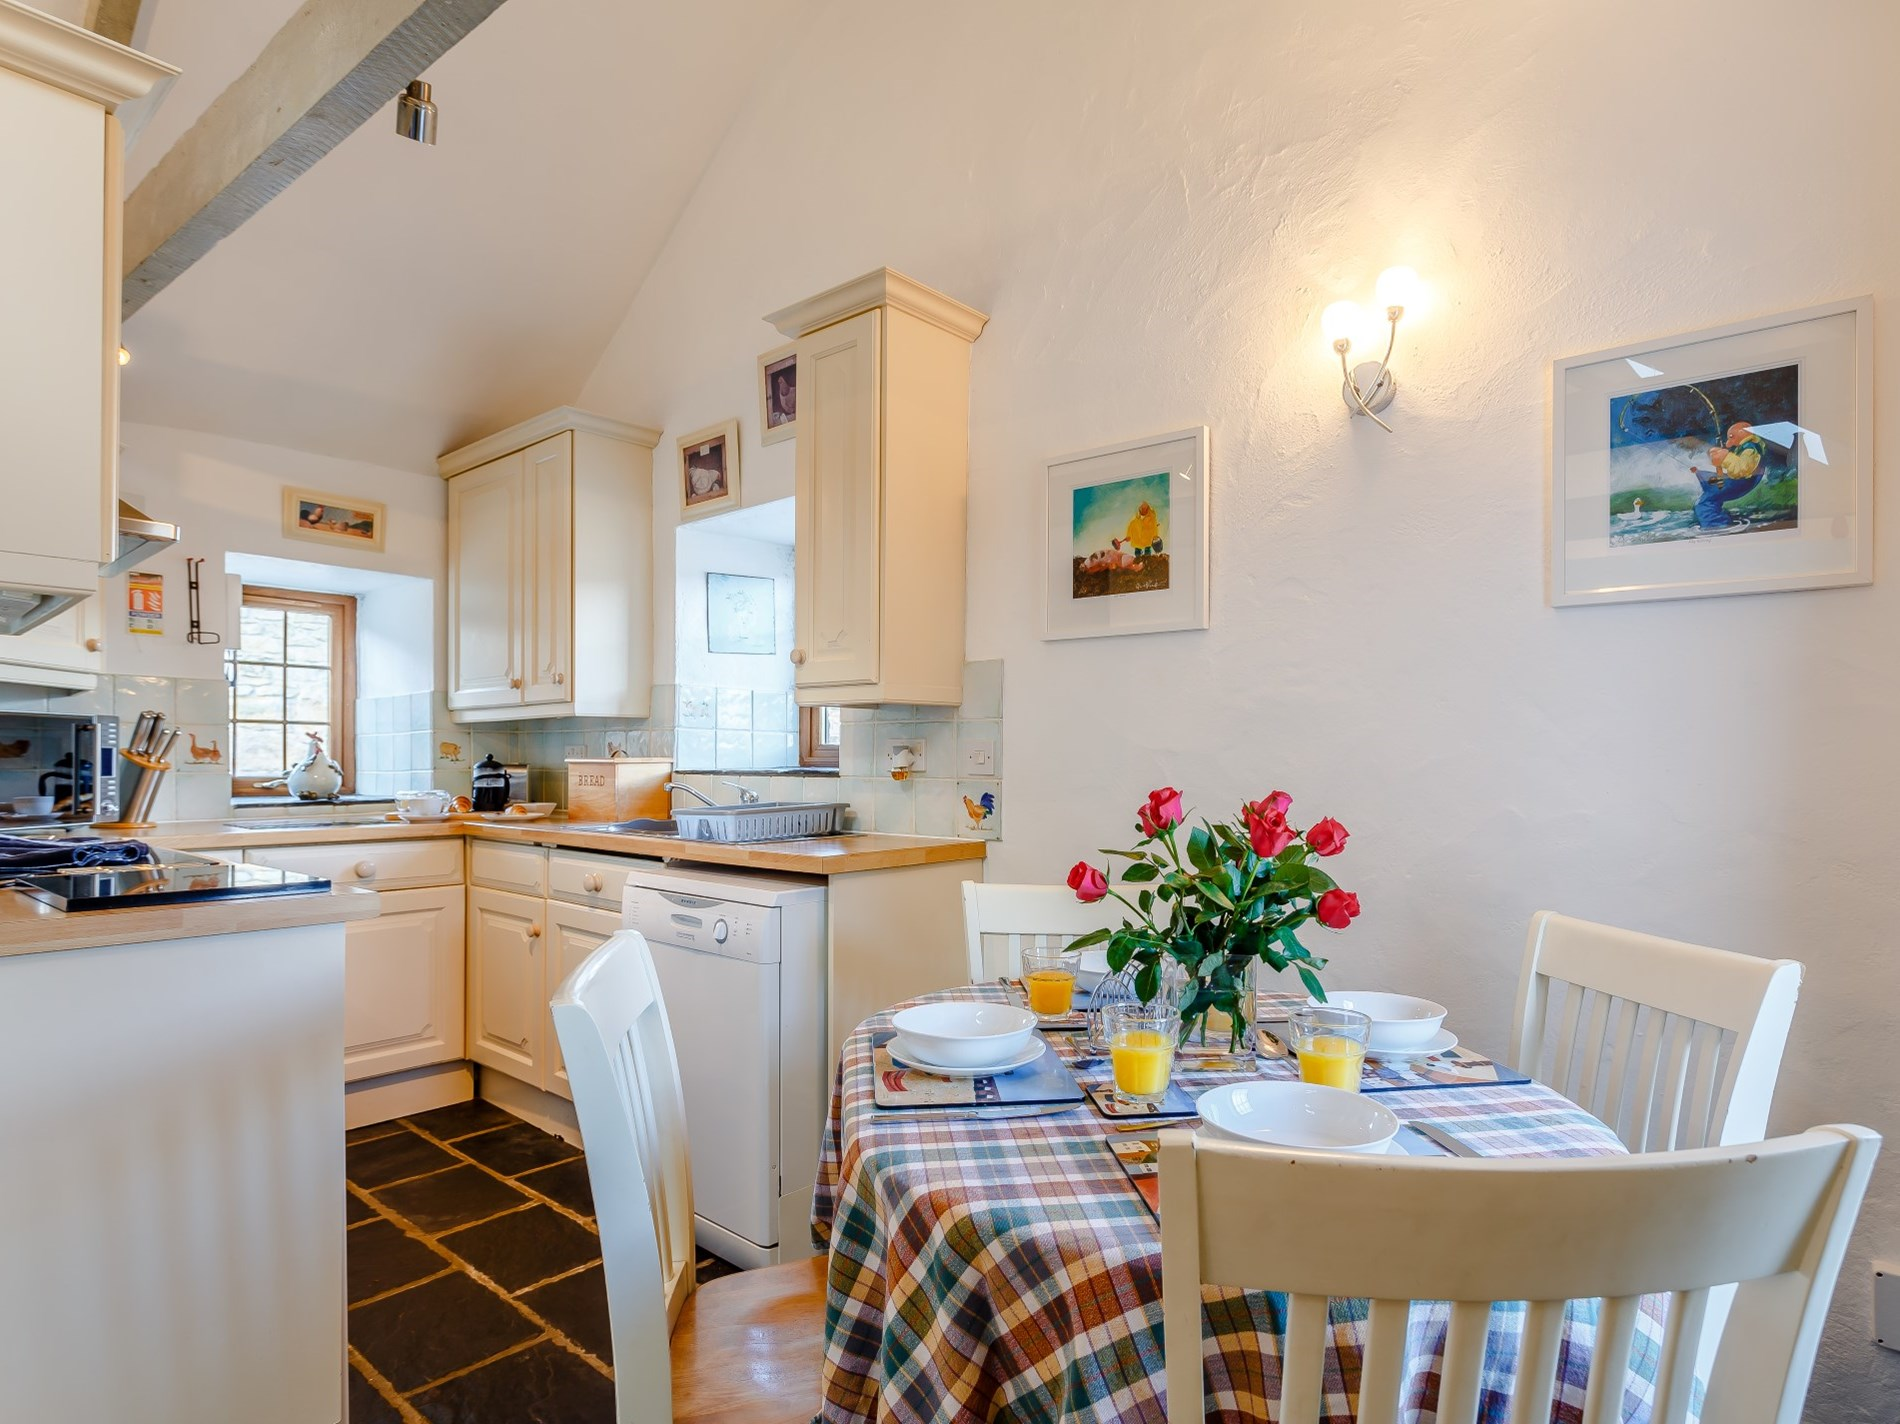 Bright and open kitchen/dining arrangement